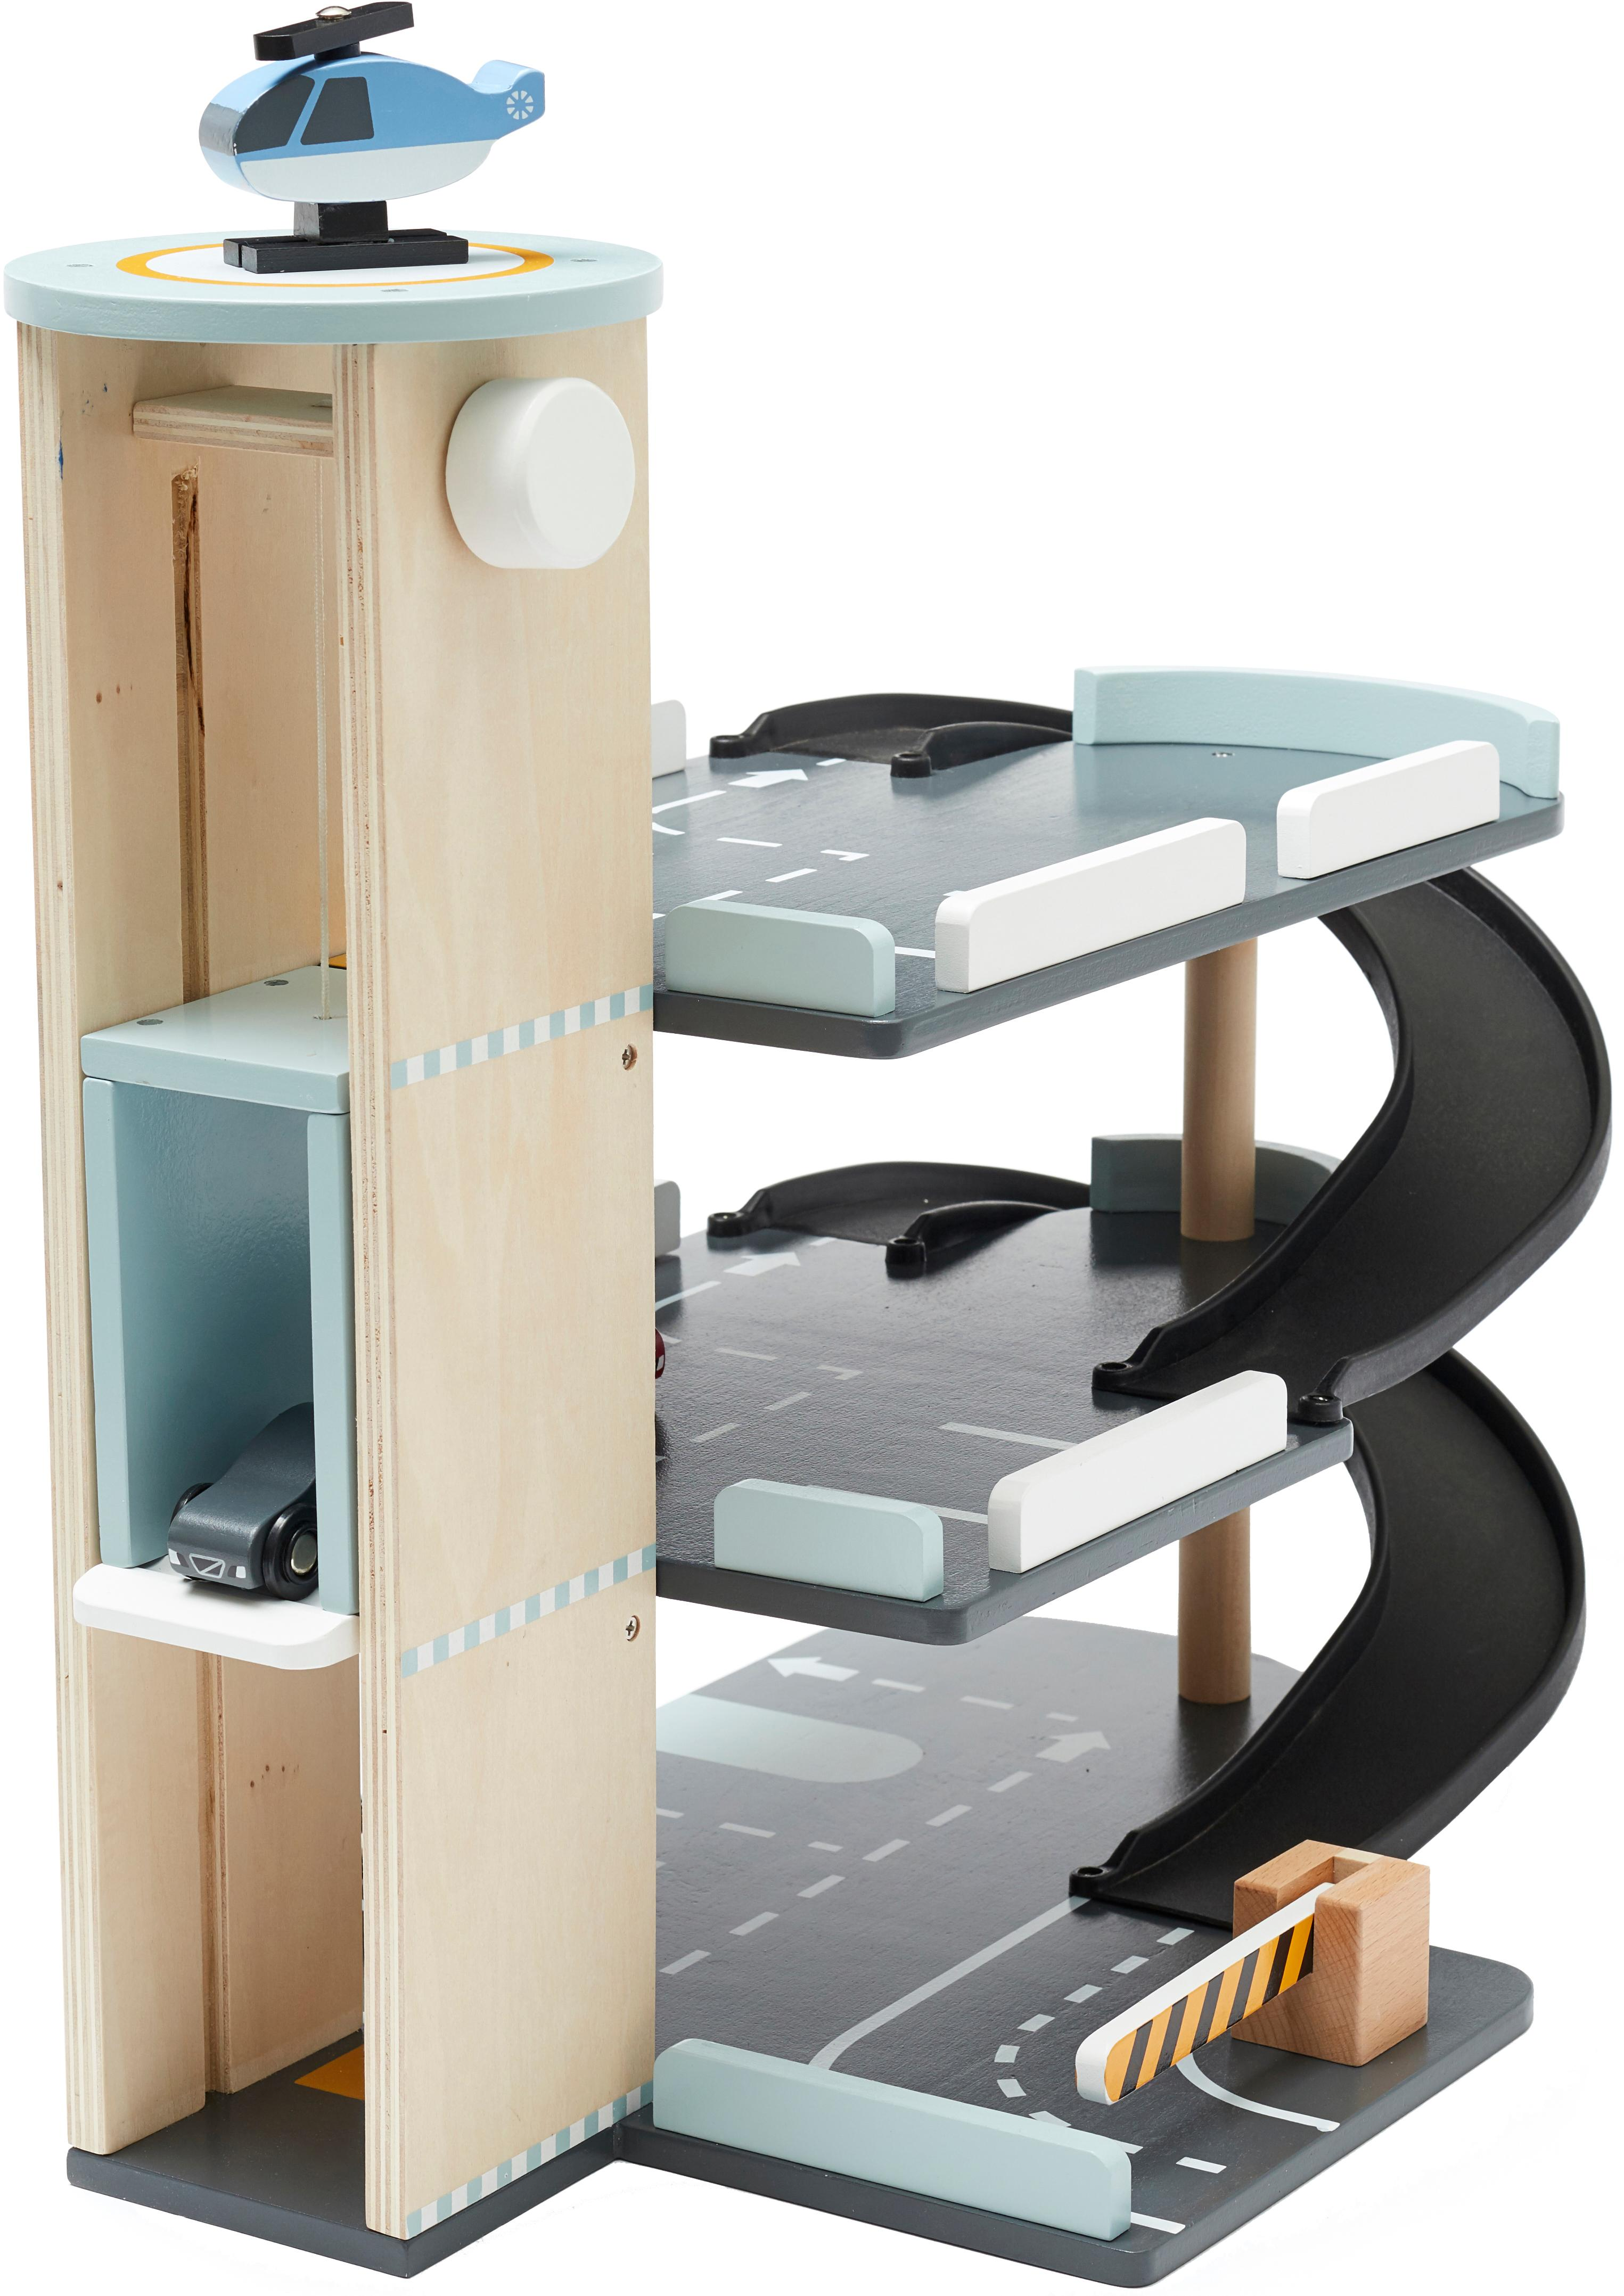 Spielzeug-Set Aiden, Holz, Mehrfarbig, 45 x 52 cm